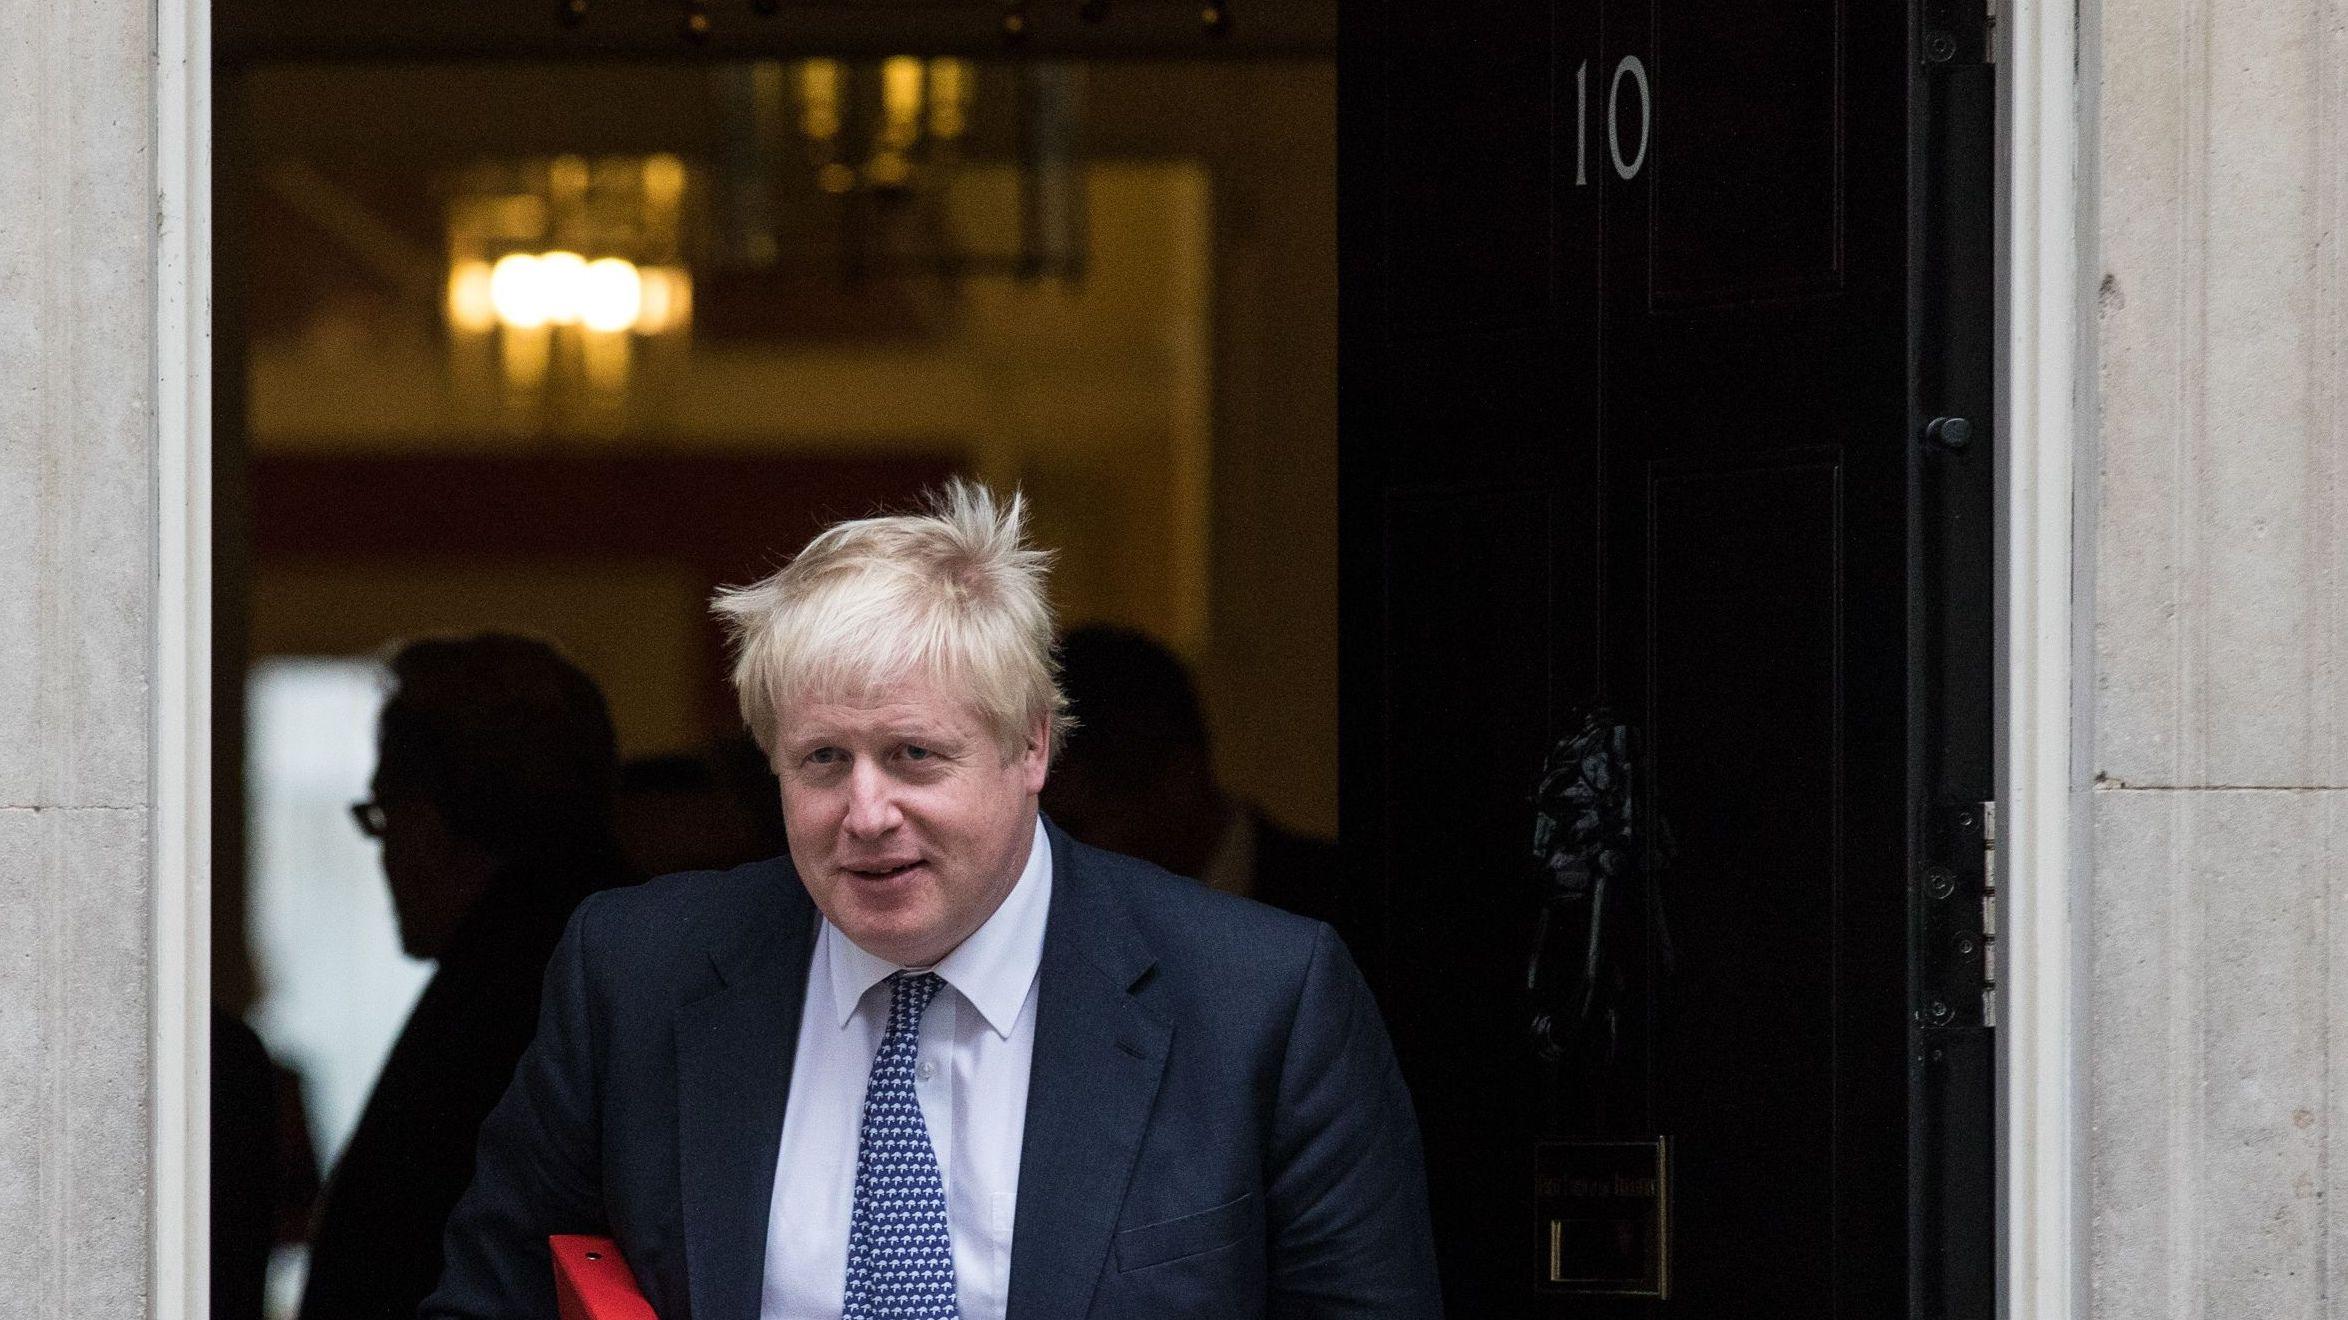 Boris Johnson am Eingang von 10 Downing Street